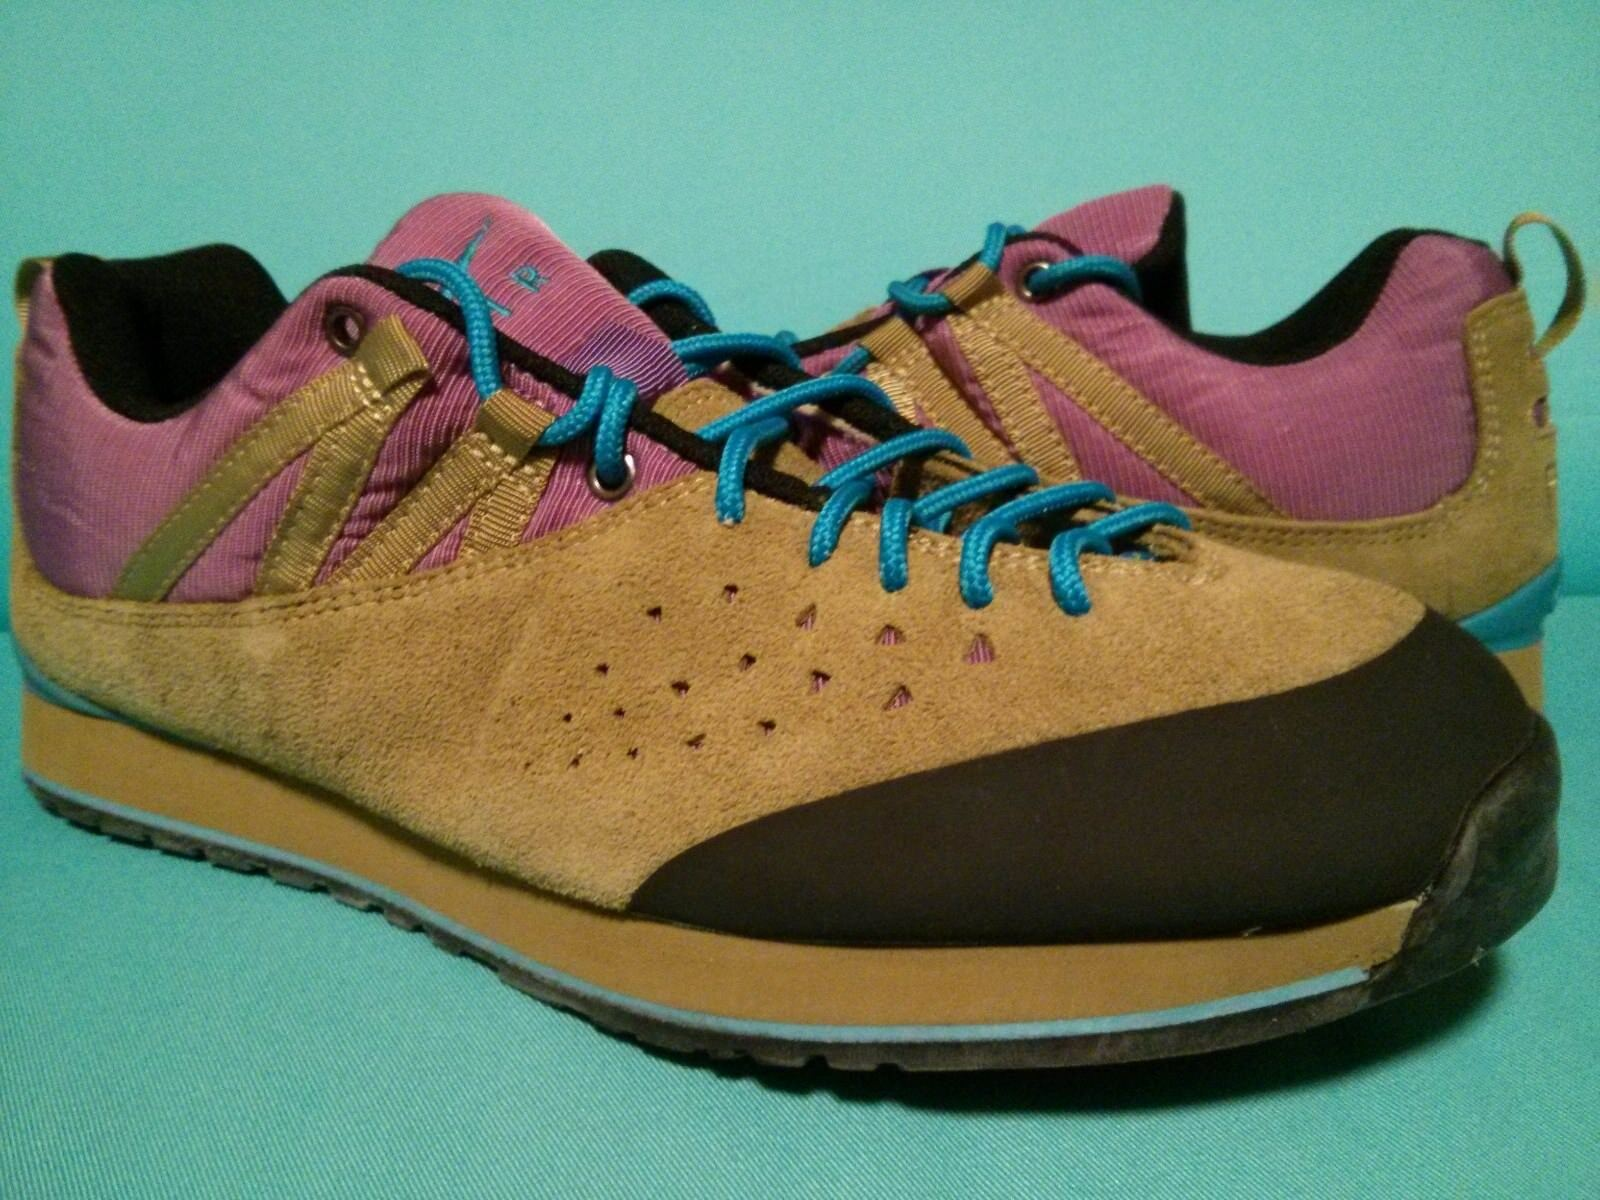 [Nike Archive] DS 2001 NIKE AIR OKWAHN 305198-341 ACG NSW SZ12